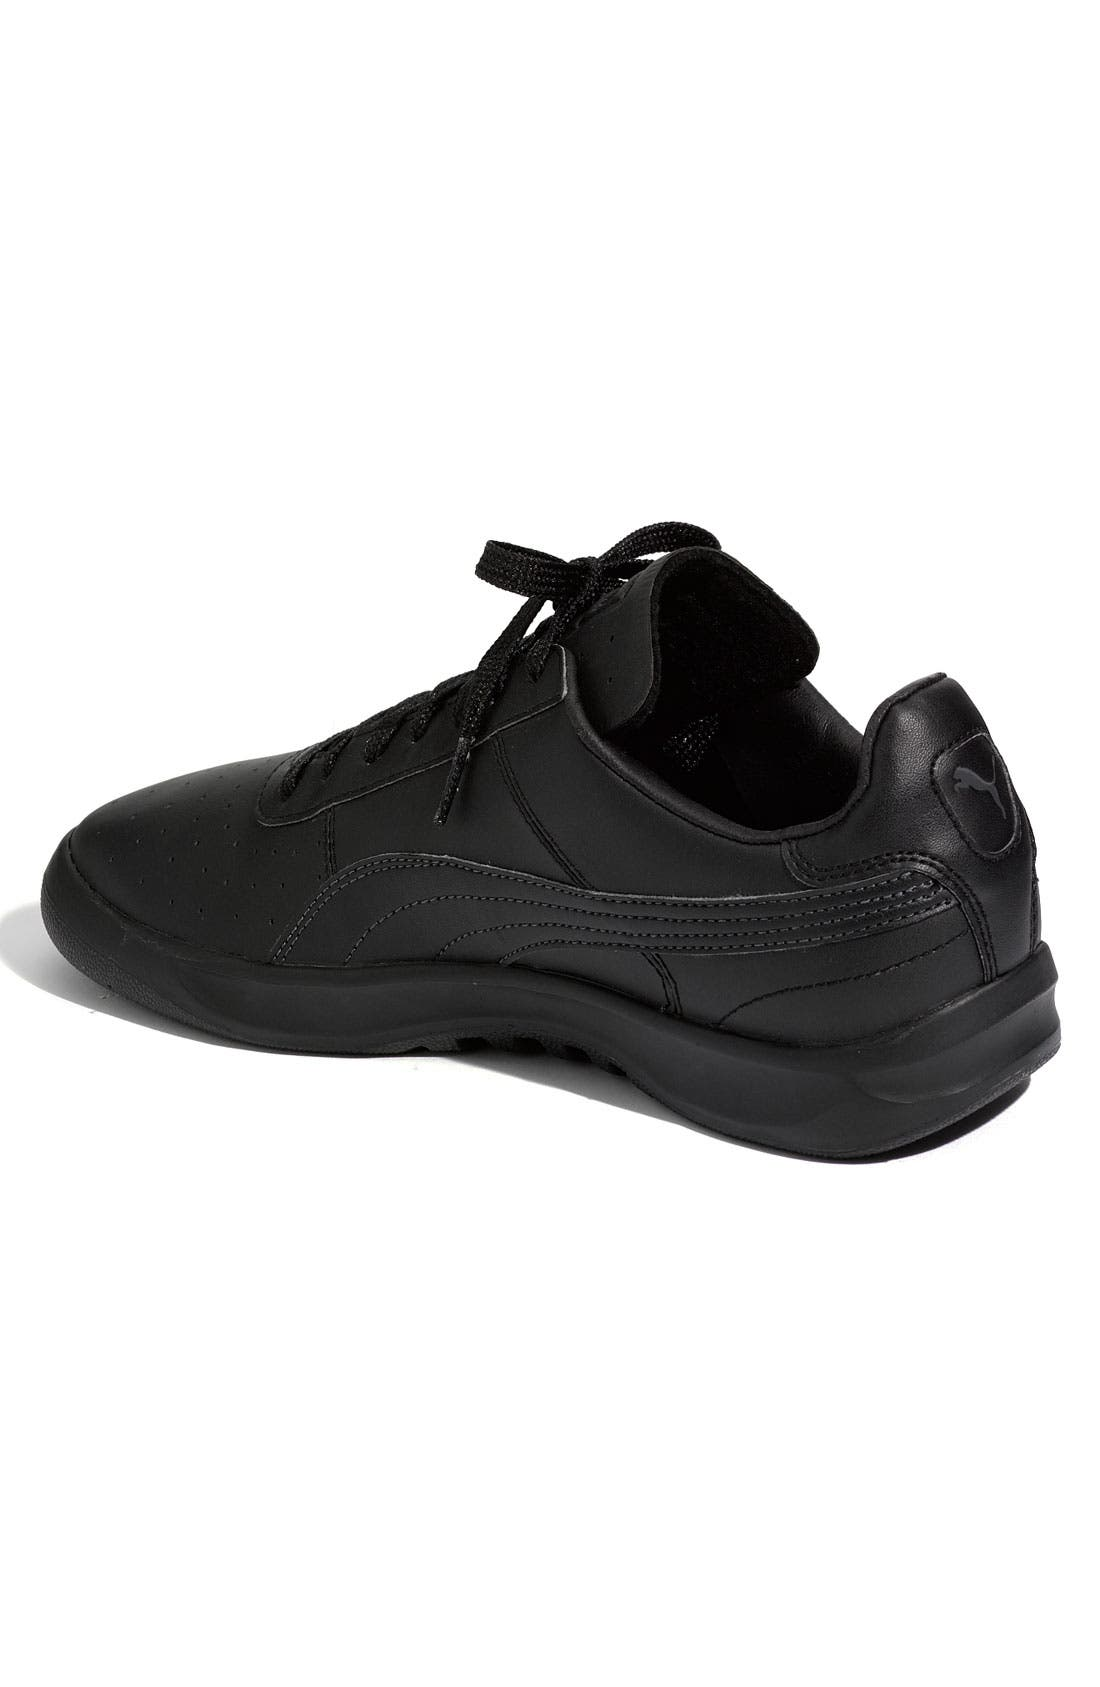 Alternate Image 2  - Puma 'G. Vilas L2' Sneaker